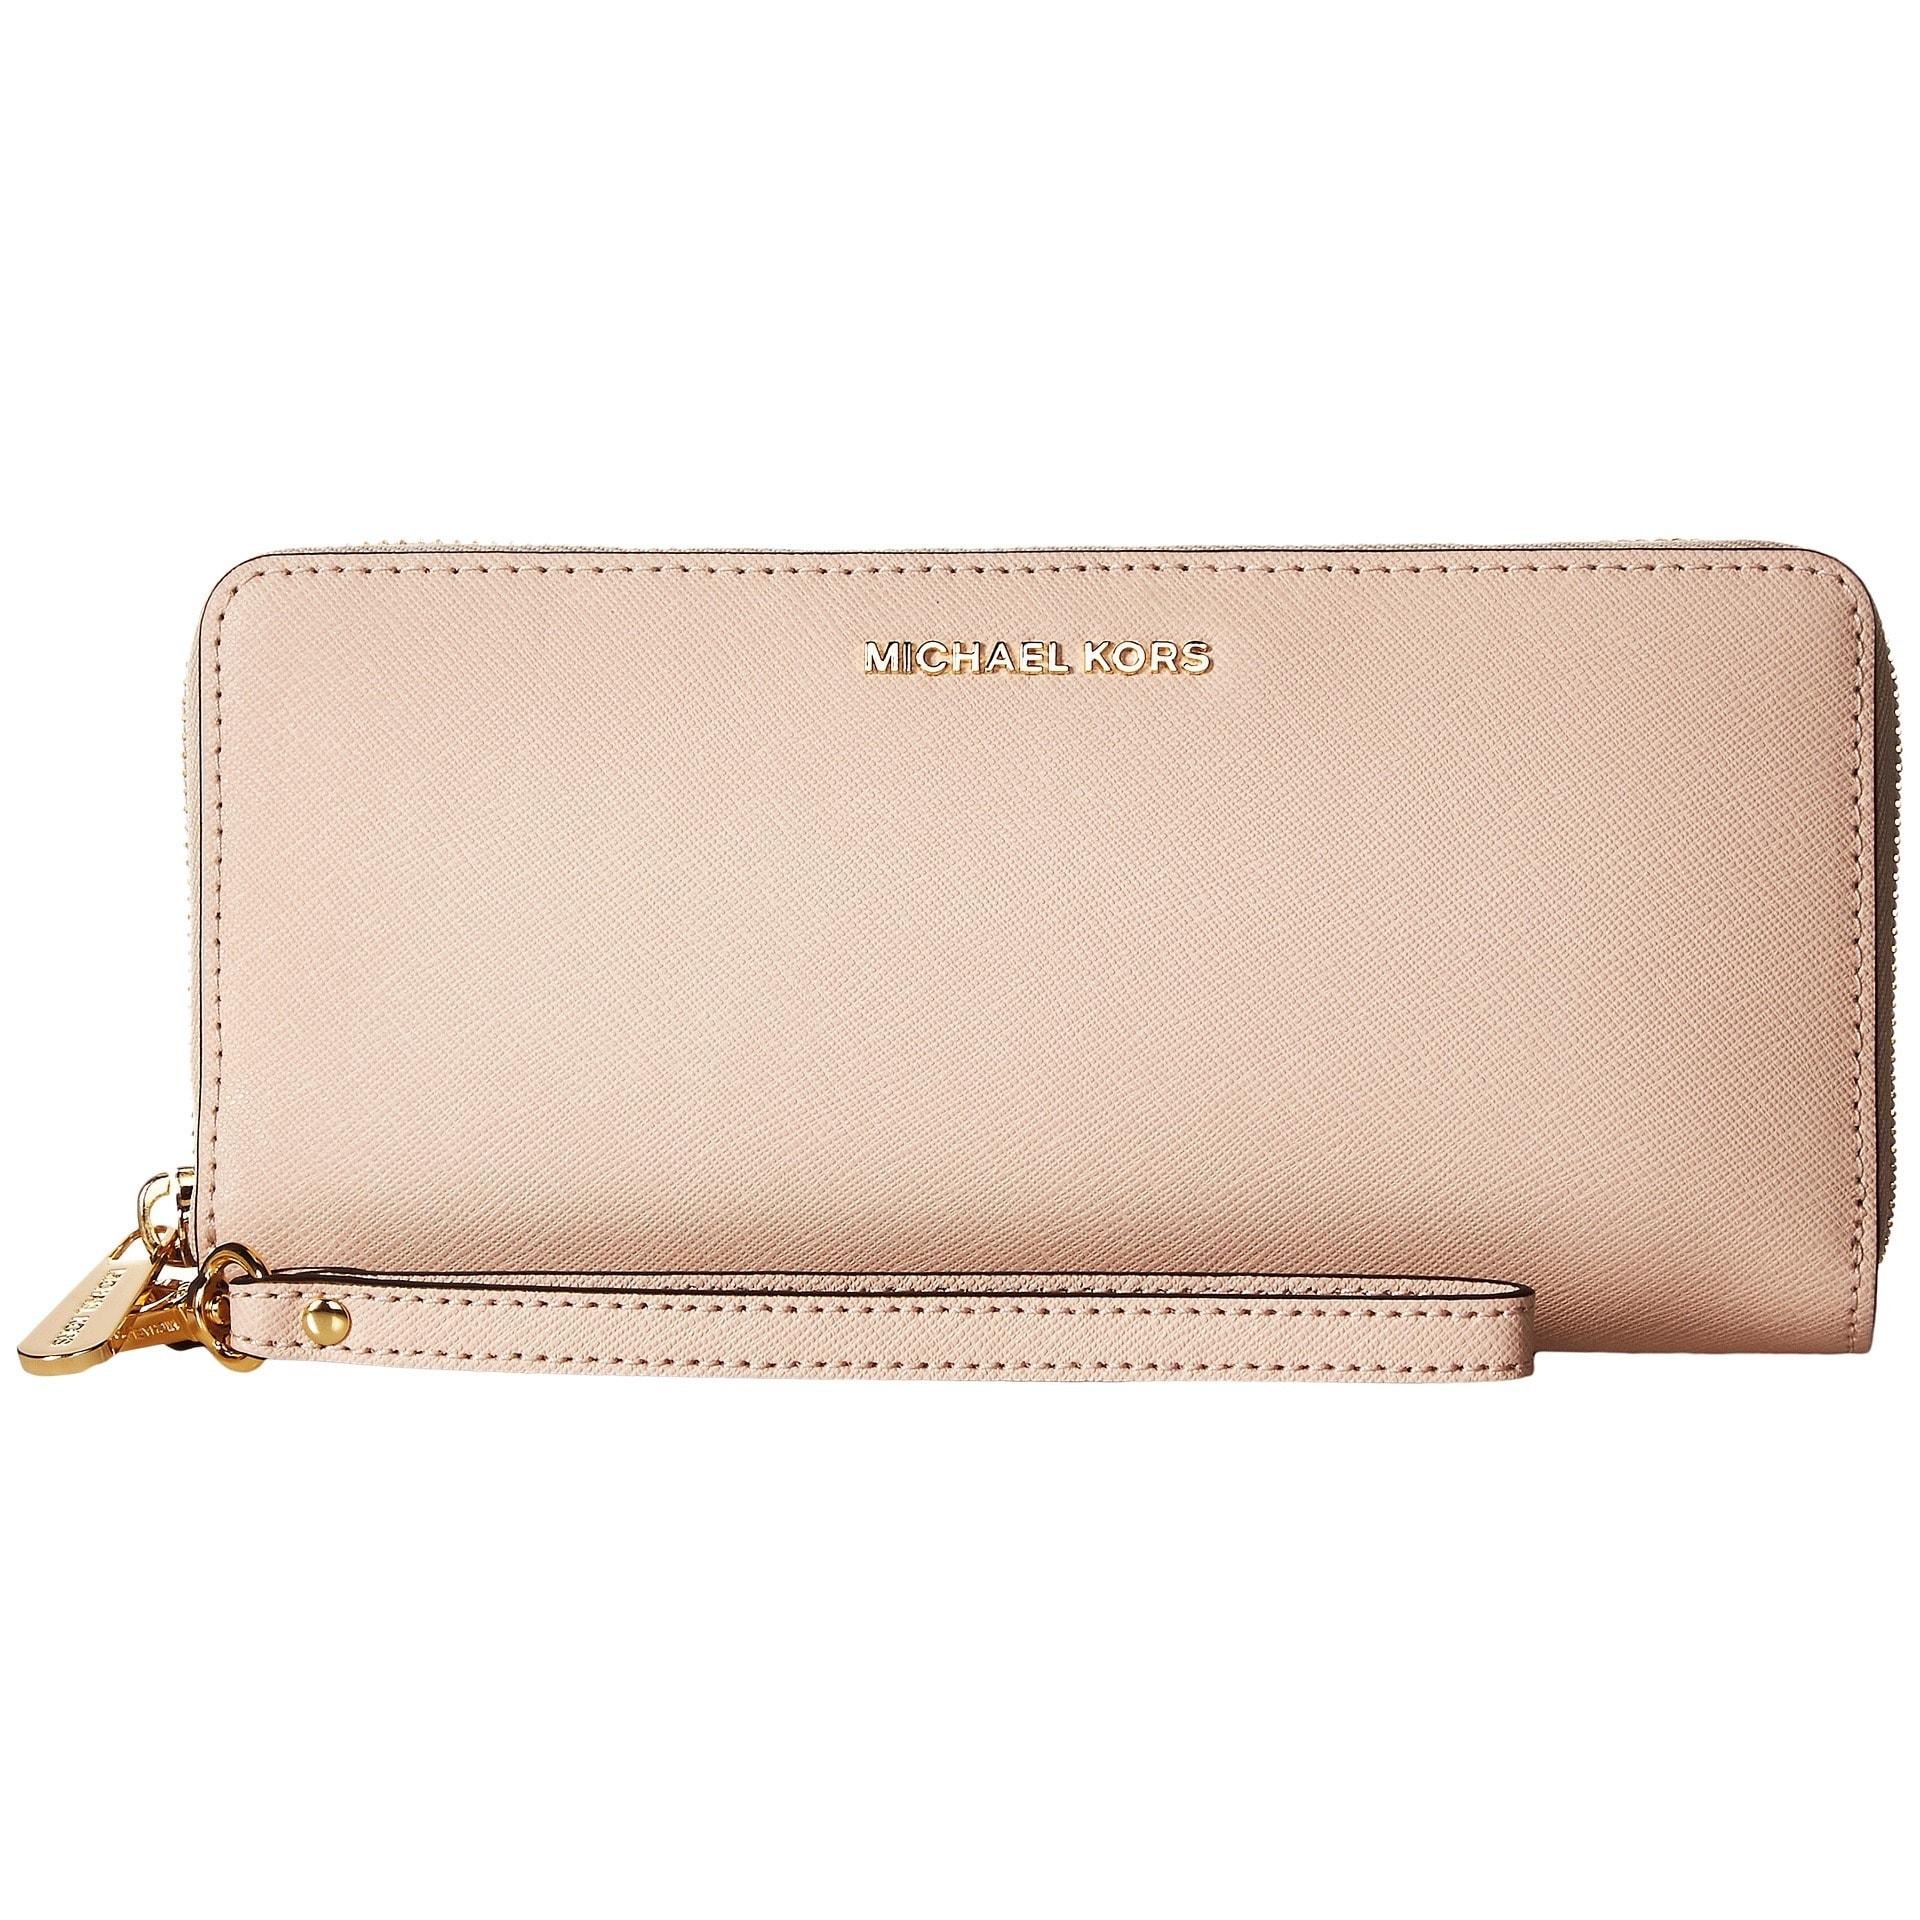 b00c2aeabdbd Shop Michael Kors Jet Set Pink Leather Continental Travel Wallet ...